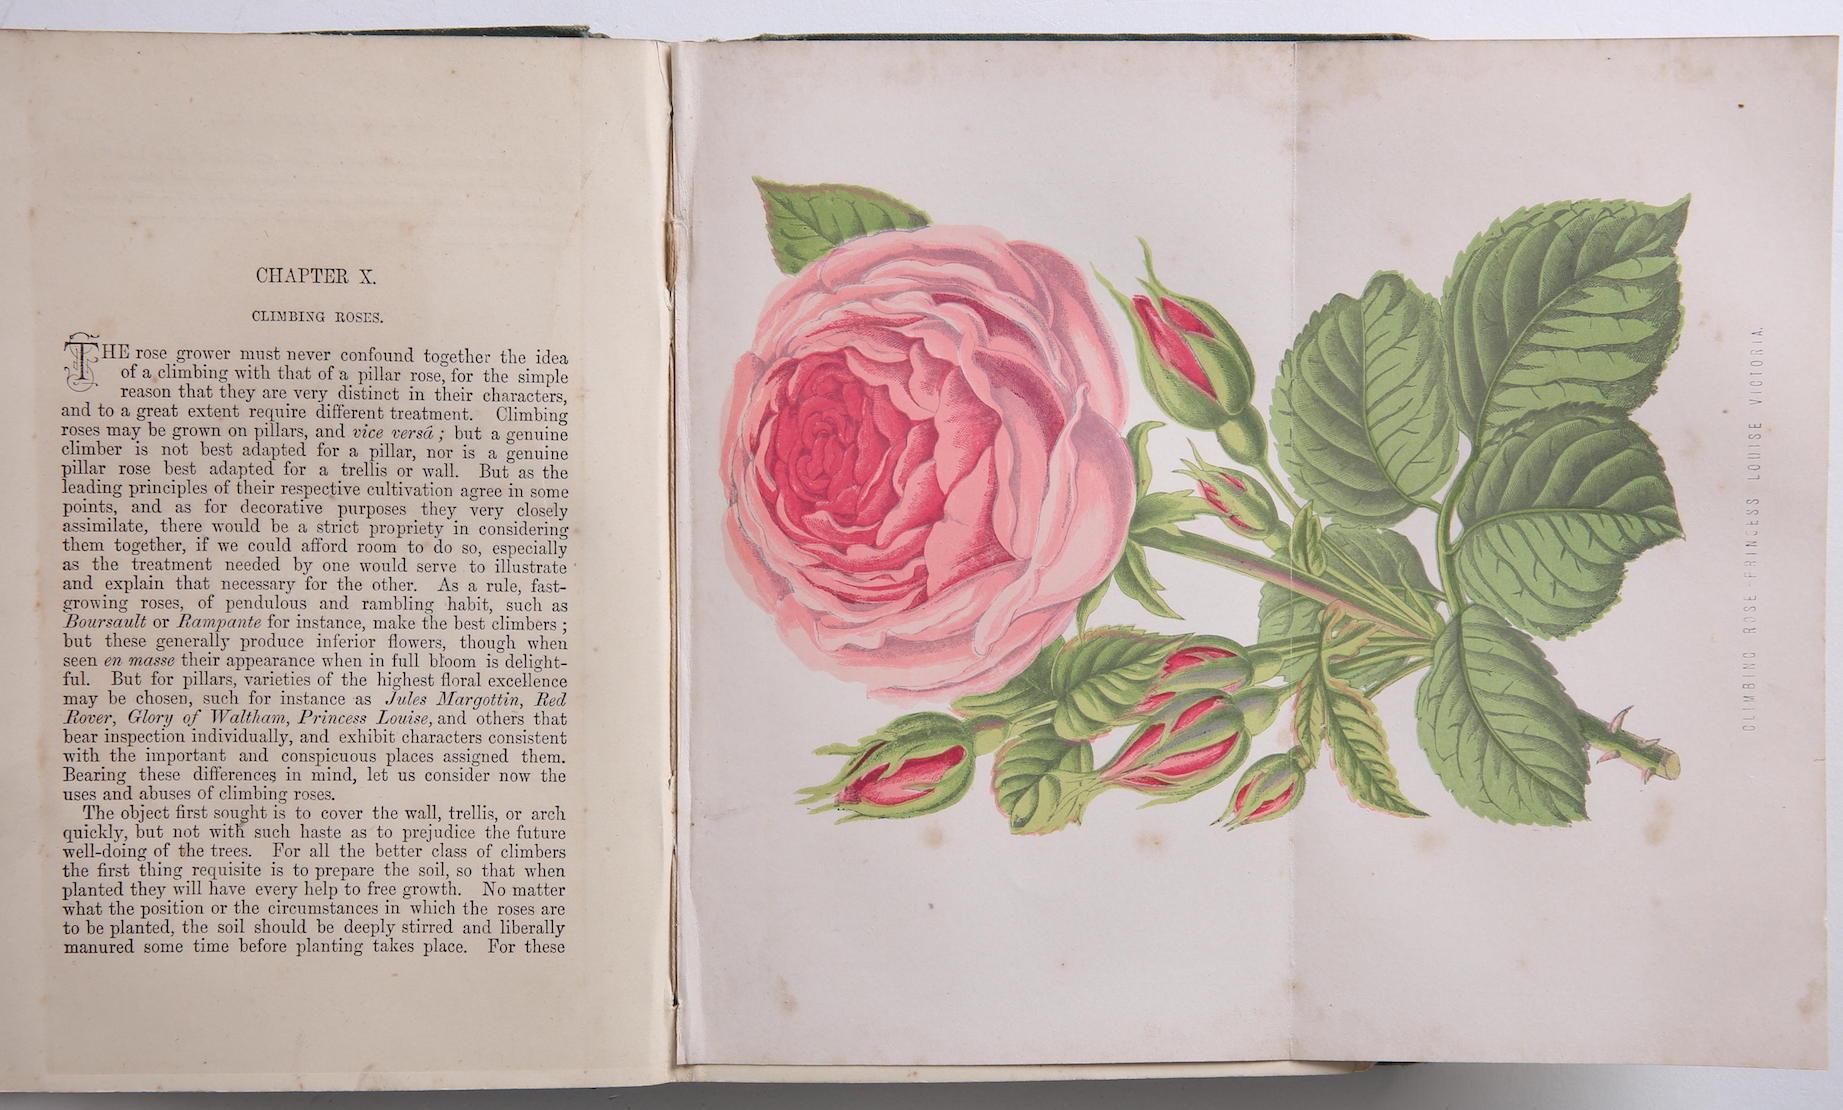 Shirley Hubbard Amateurs Rose Princess Louise Victoria